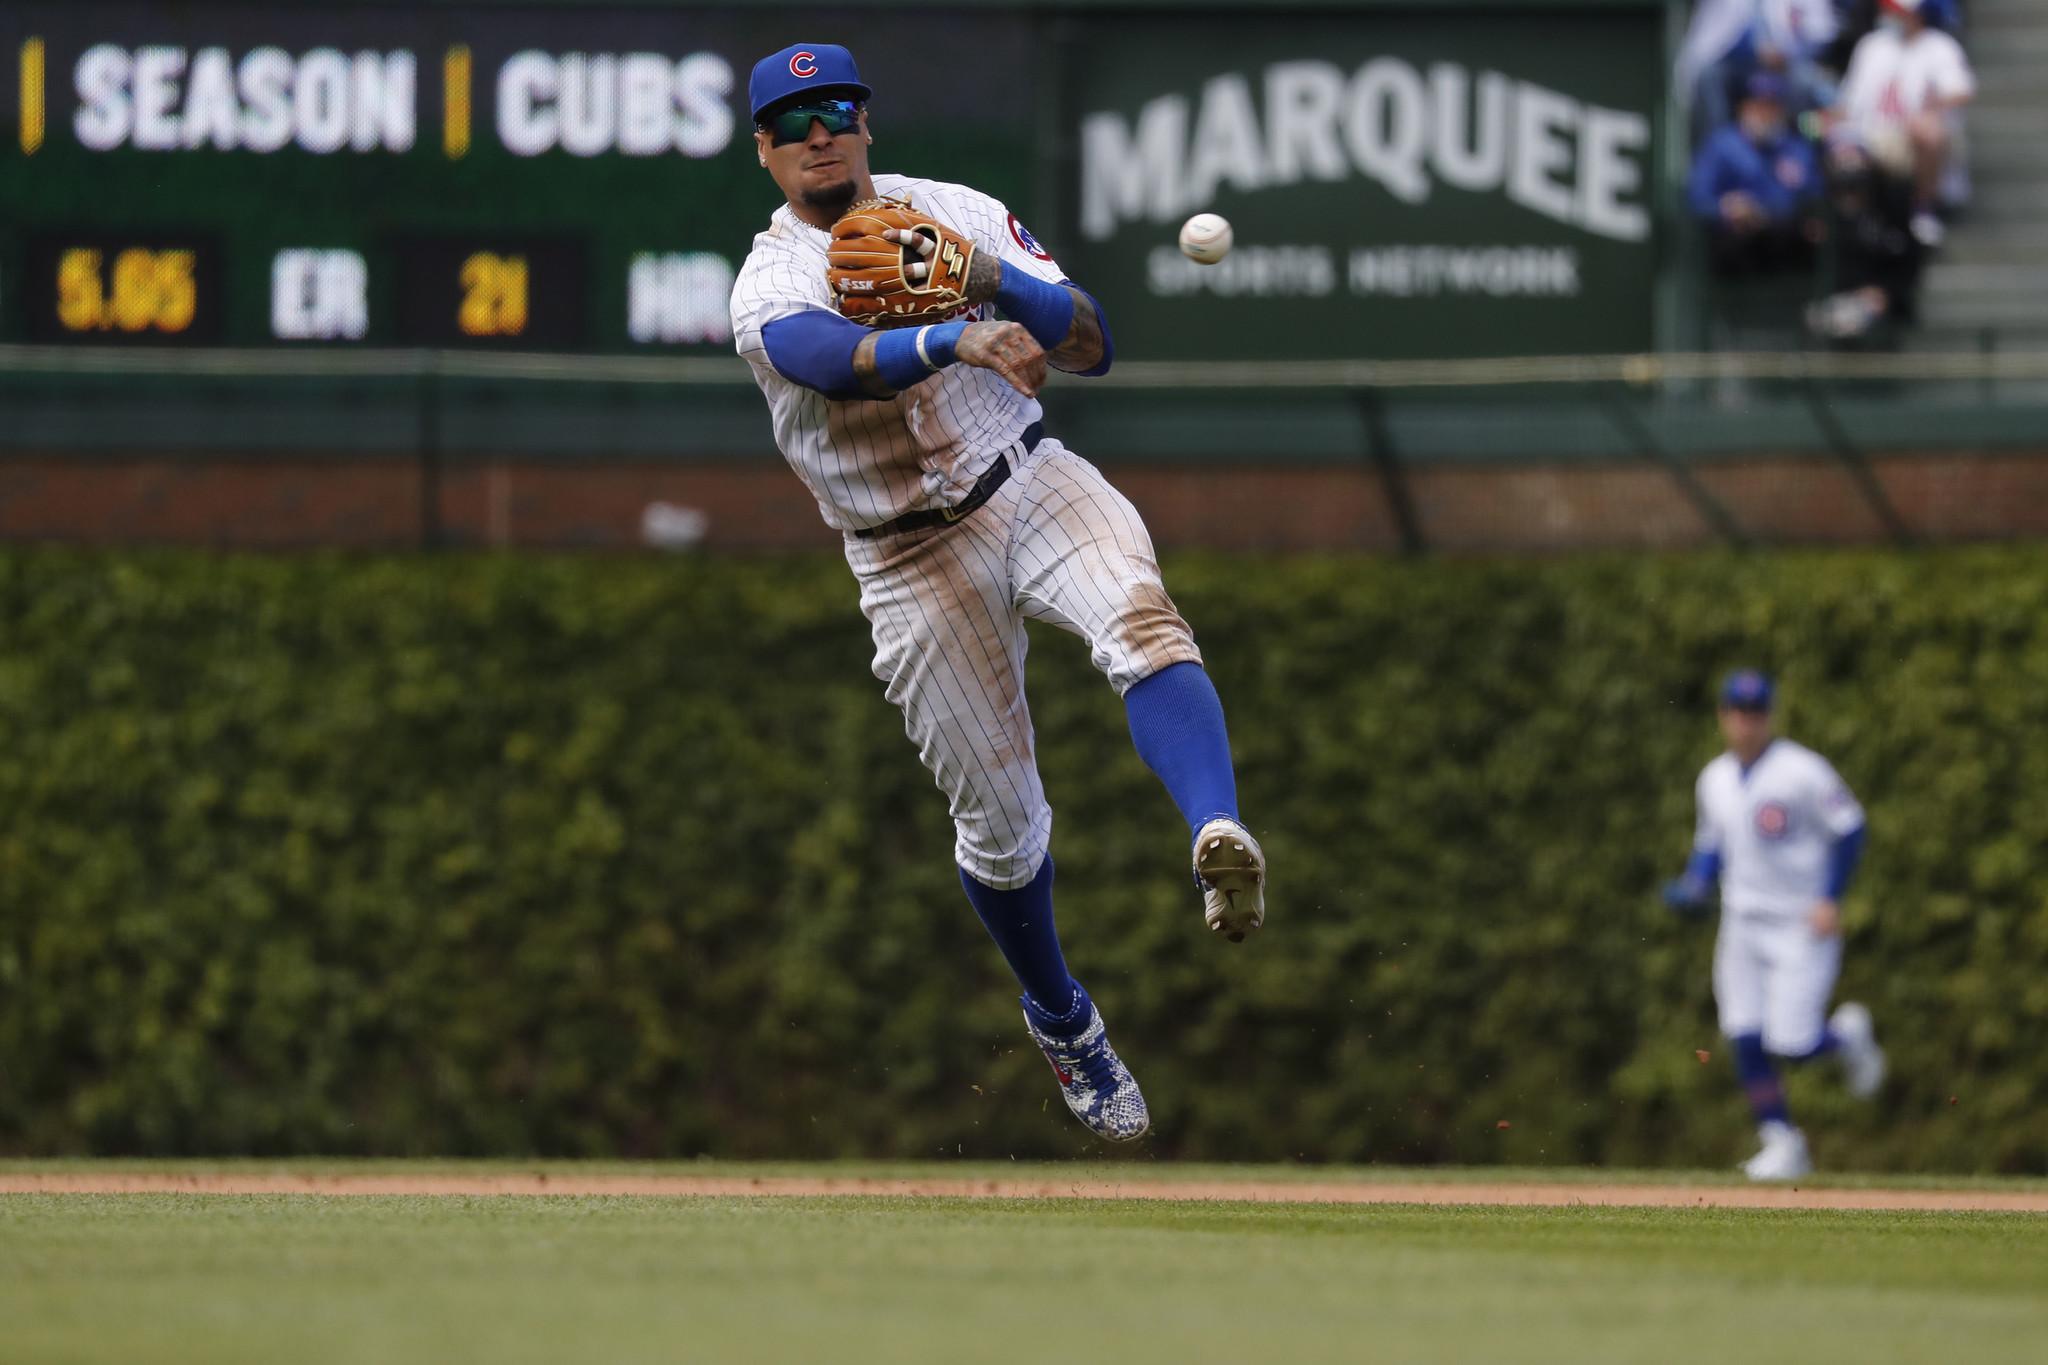 Javier Baez Chicago Cubs New Arrivals Legend Baseball Player Jersey